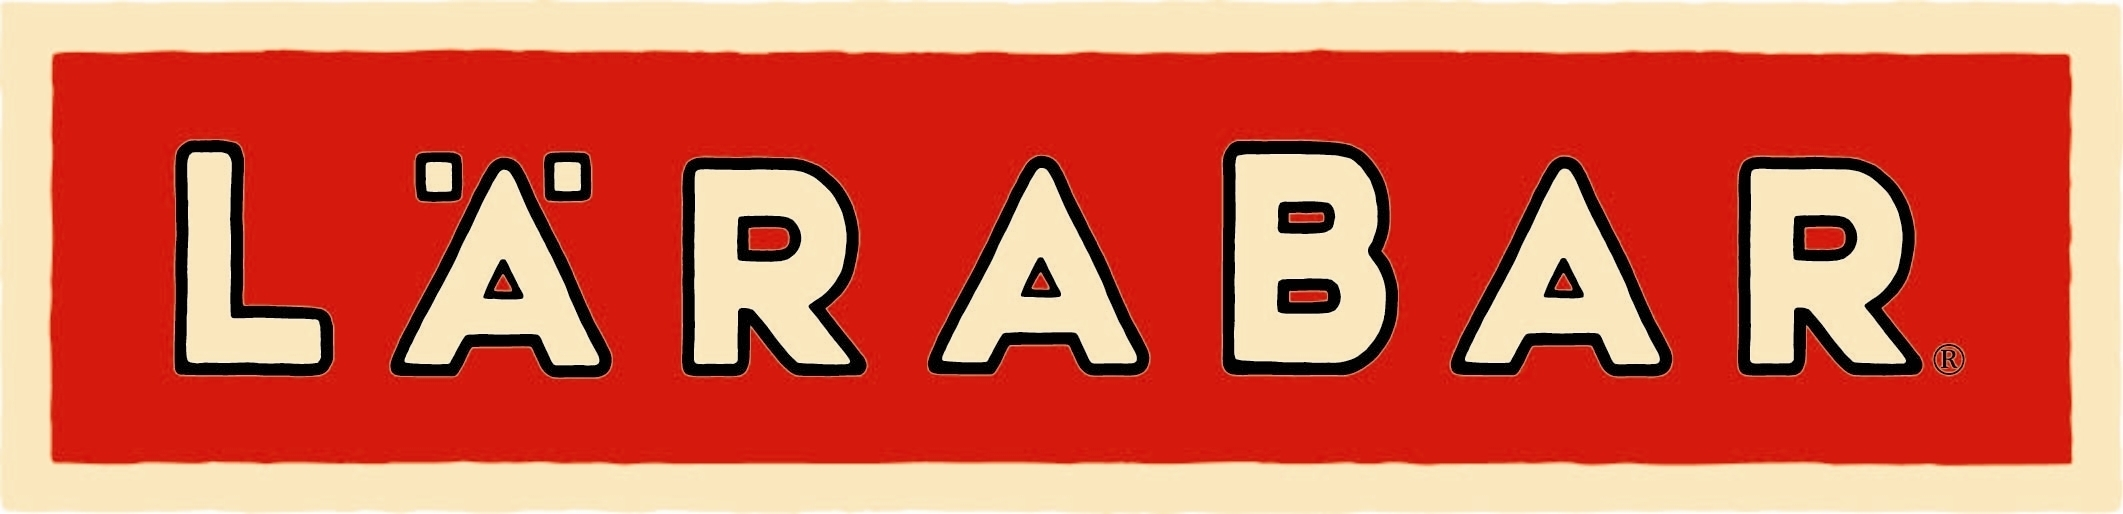 larabar Logo updated.JPG